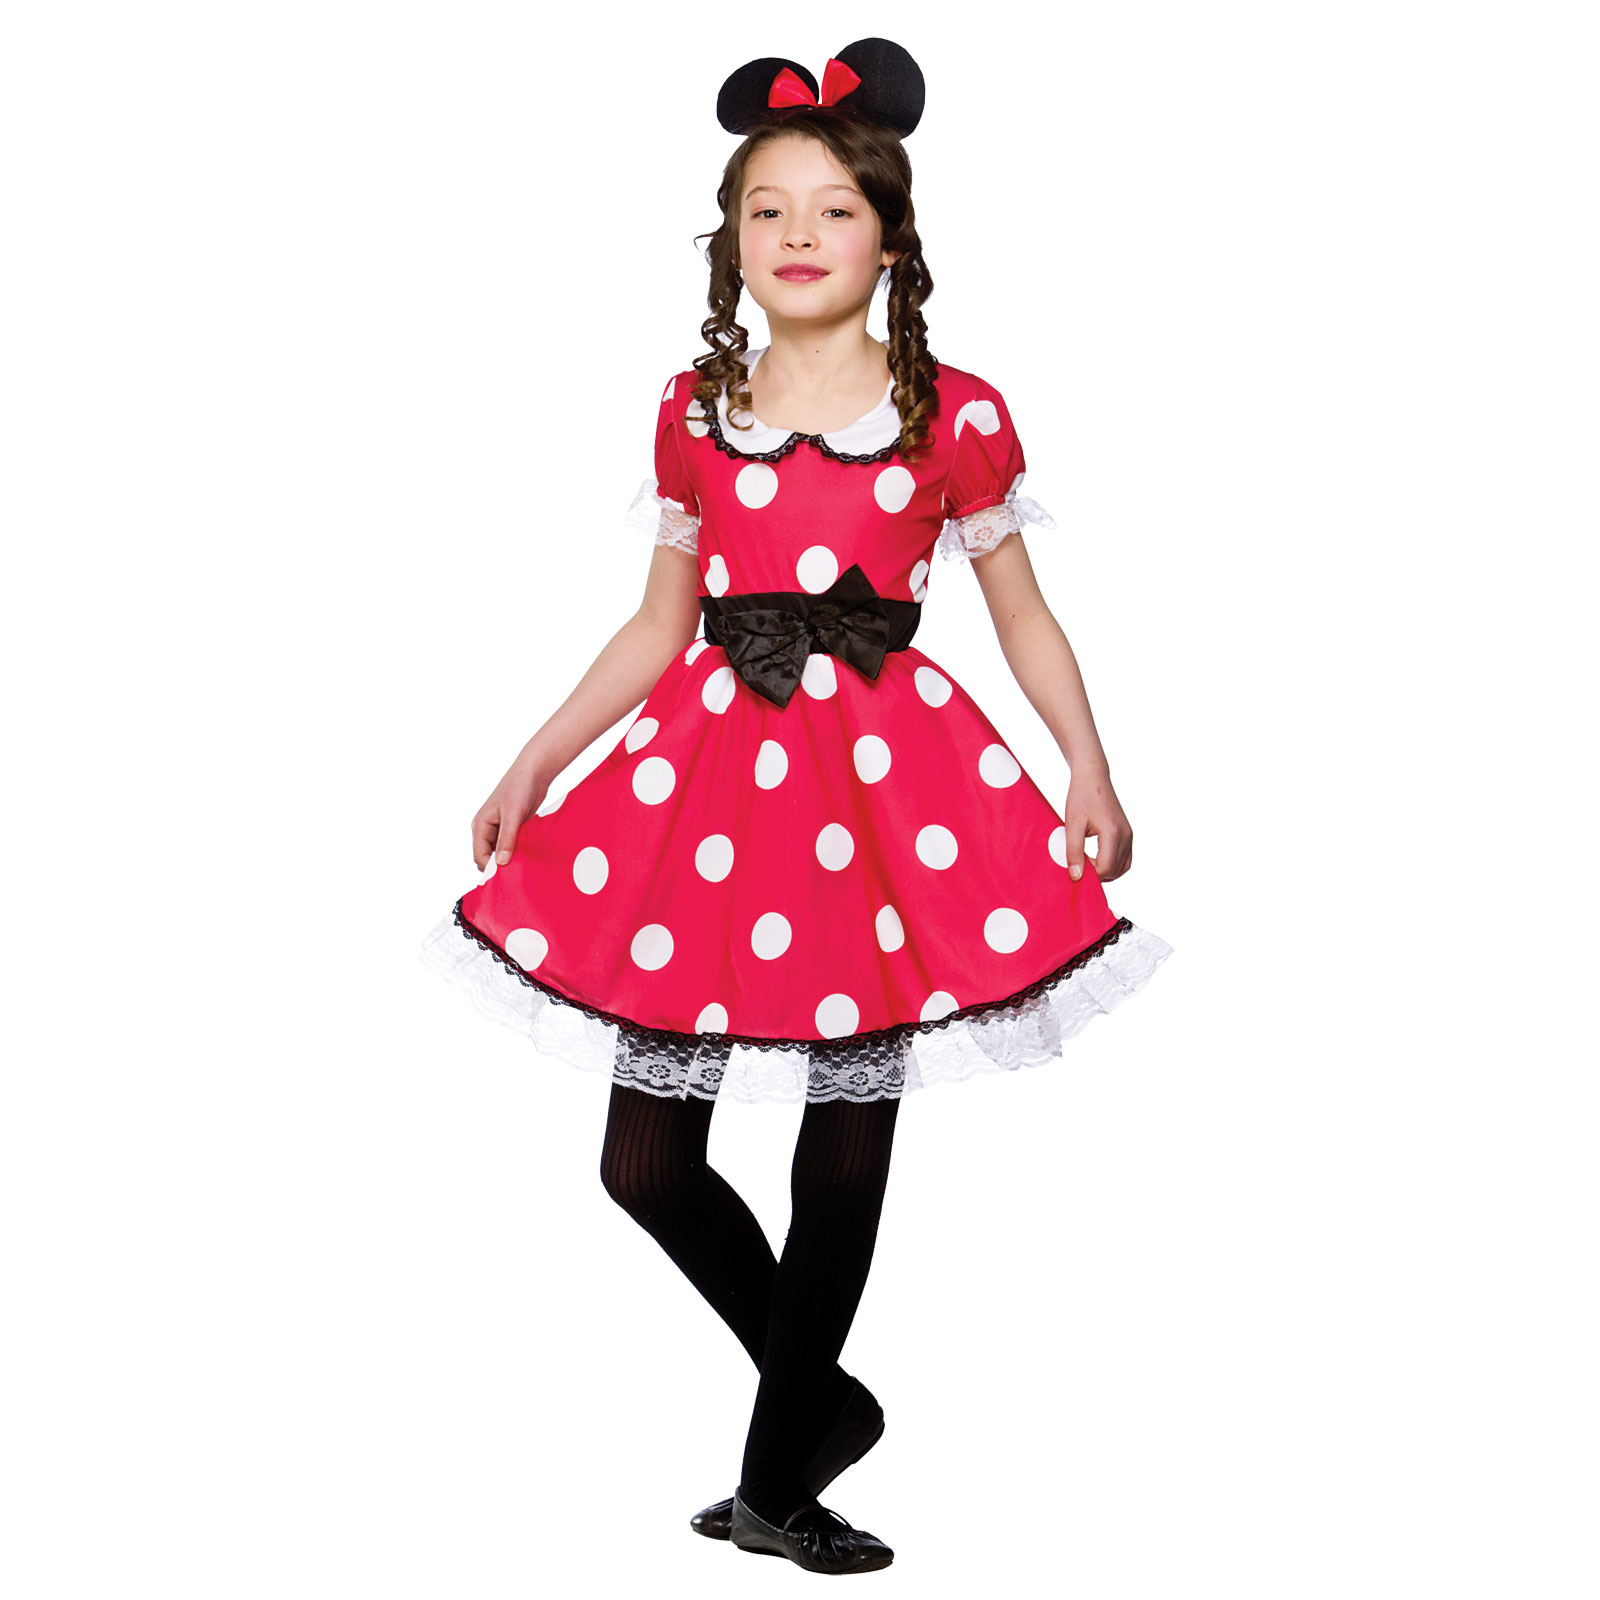 Halloween Girls Princess Fancy Dress Up Costume Outfits: Girls Cute Mouse Girl Costume Fancy Dress Up Party